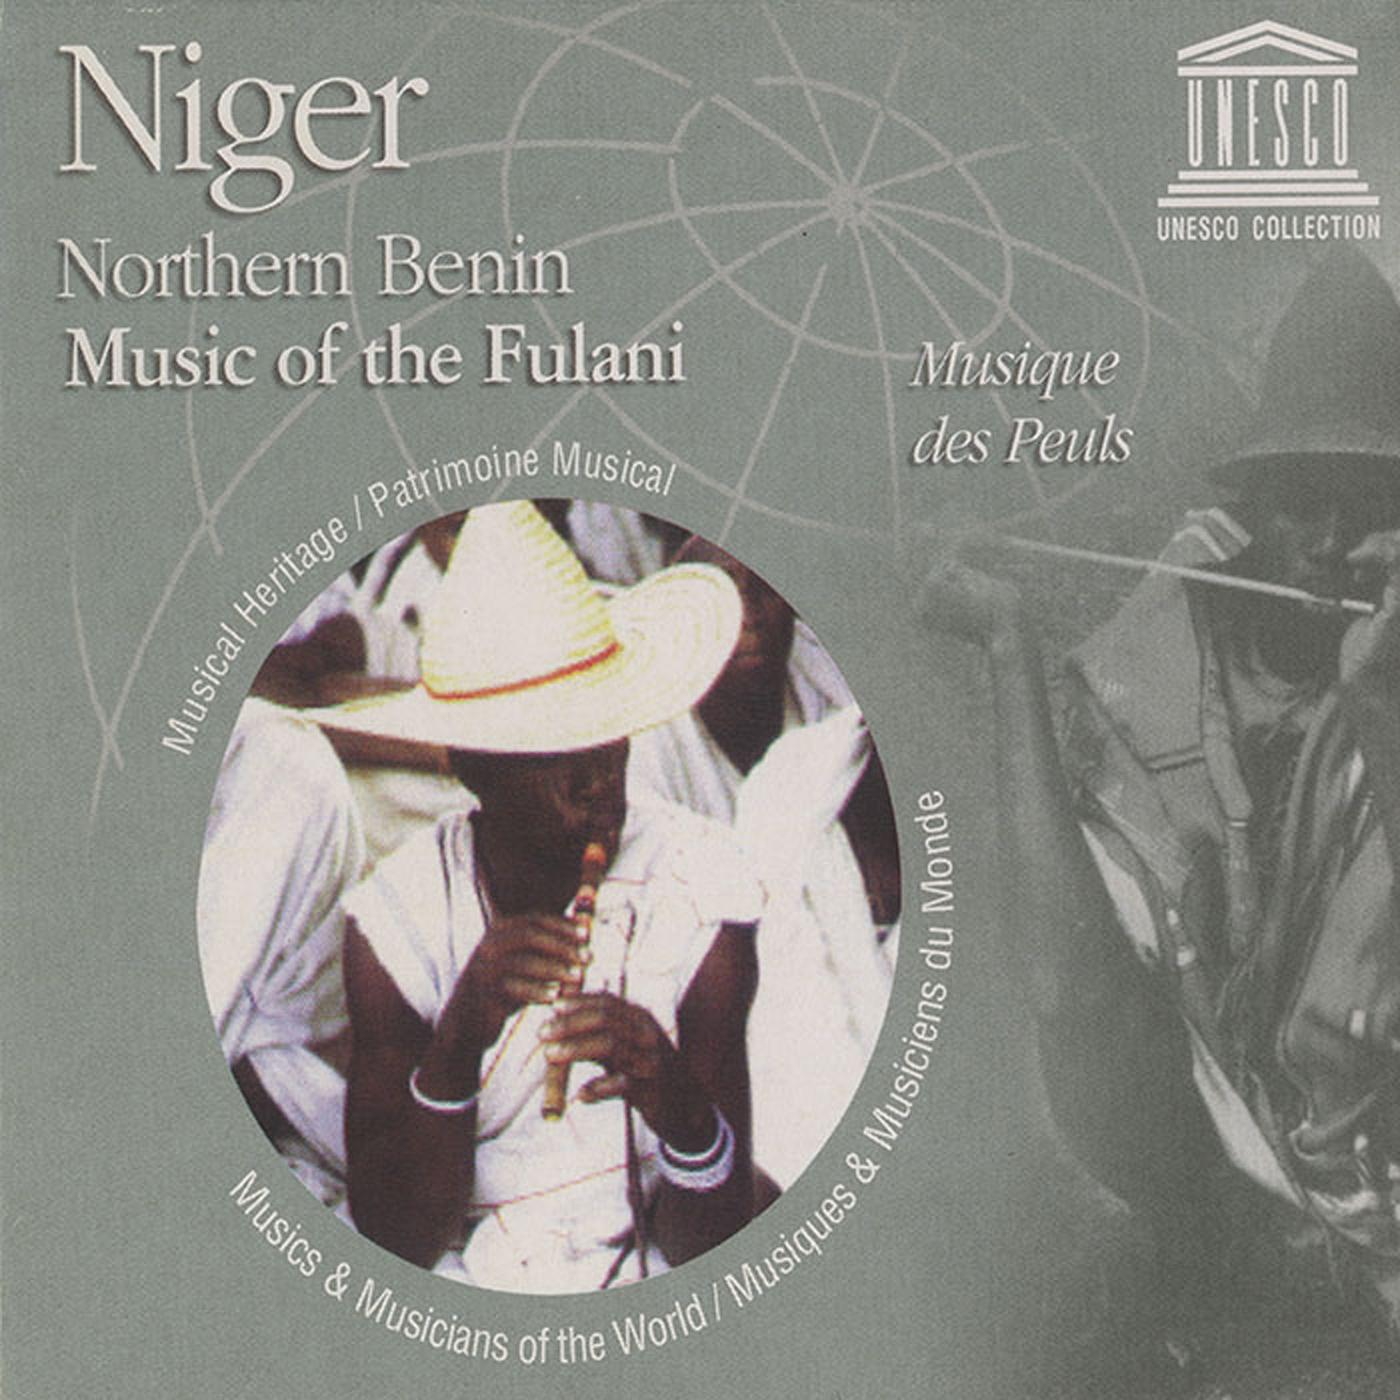 Niger / Northern Benin: Music of the Fulani | Smithsonian Folkways